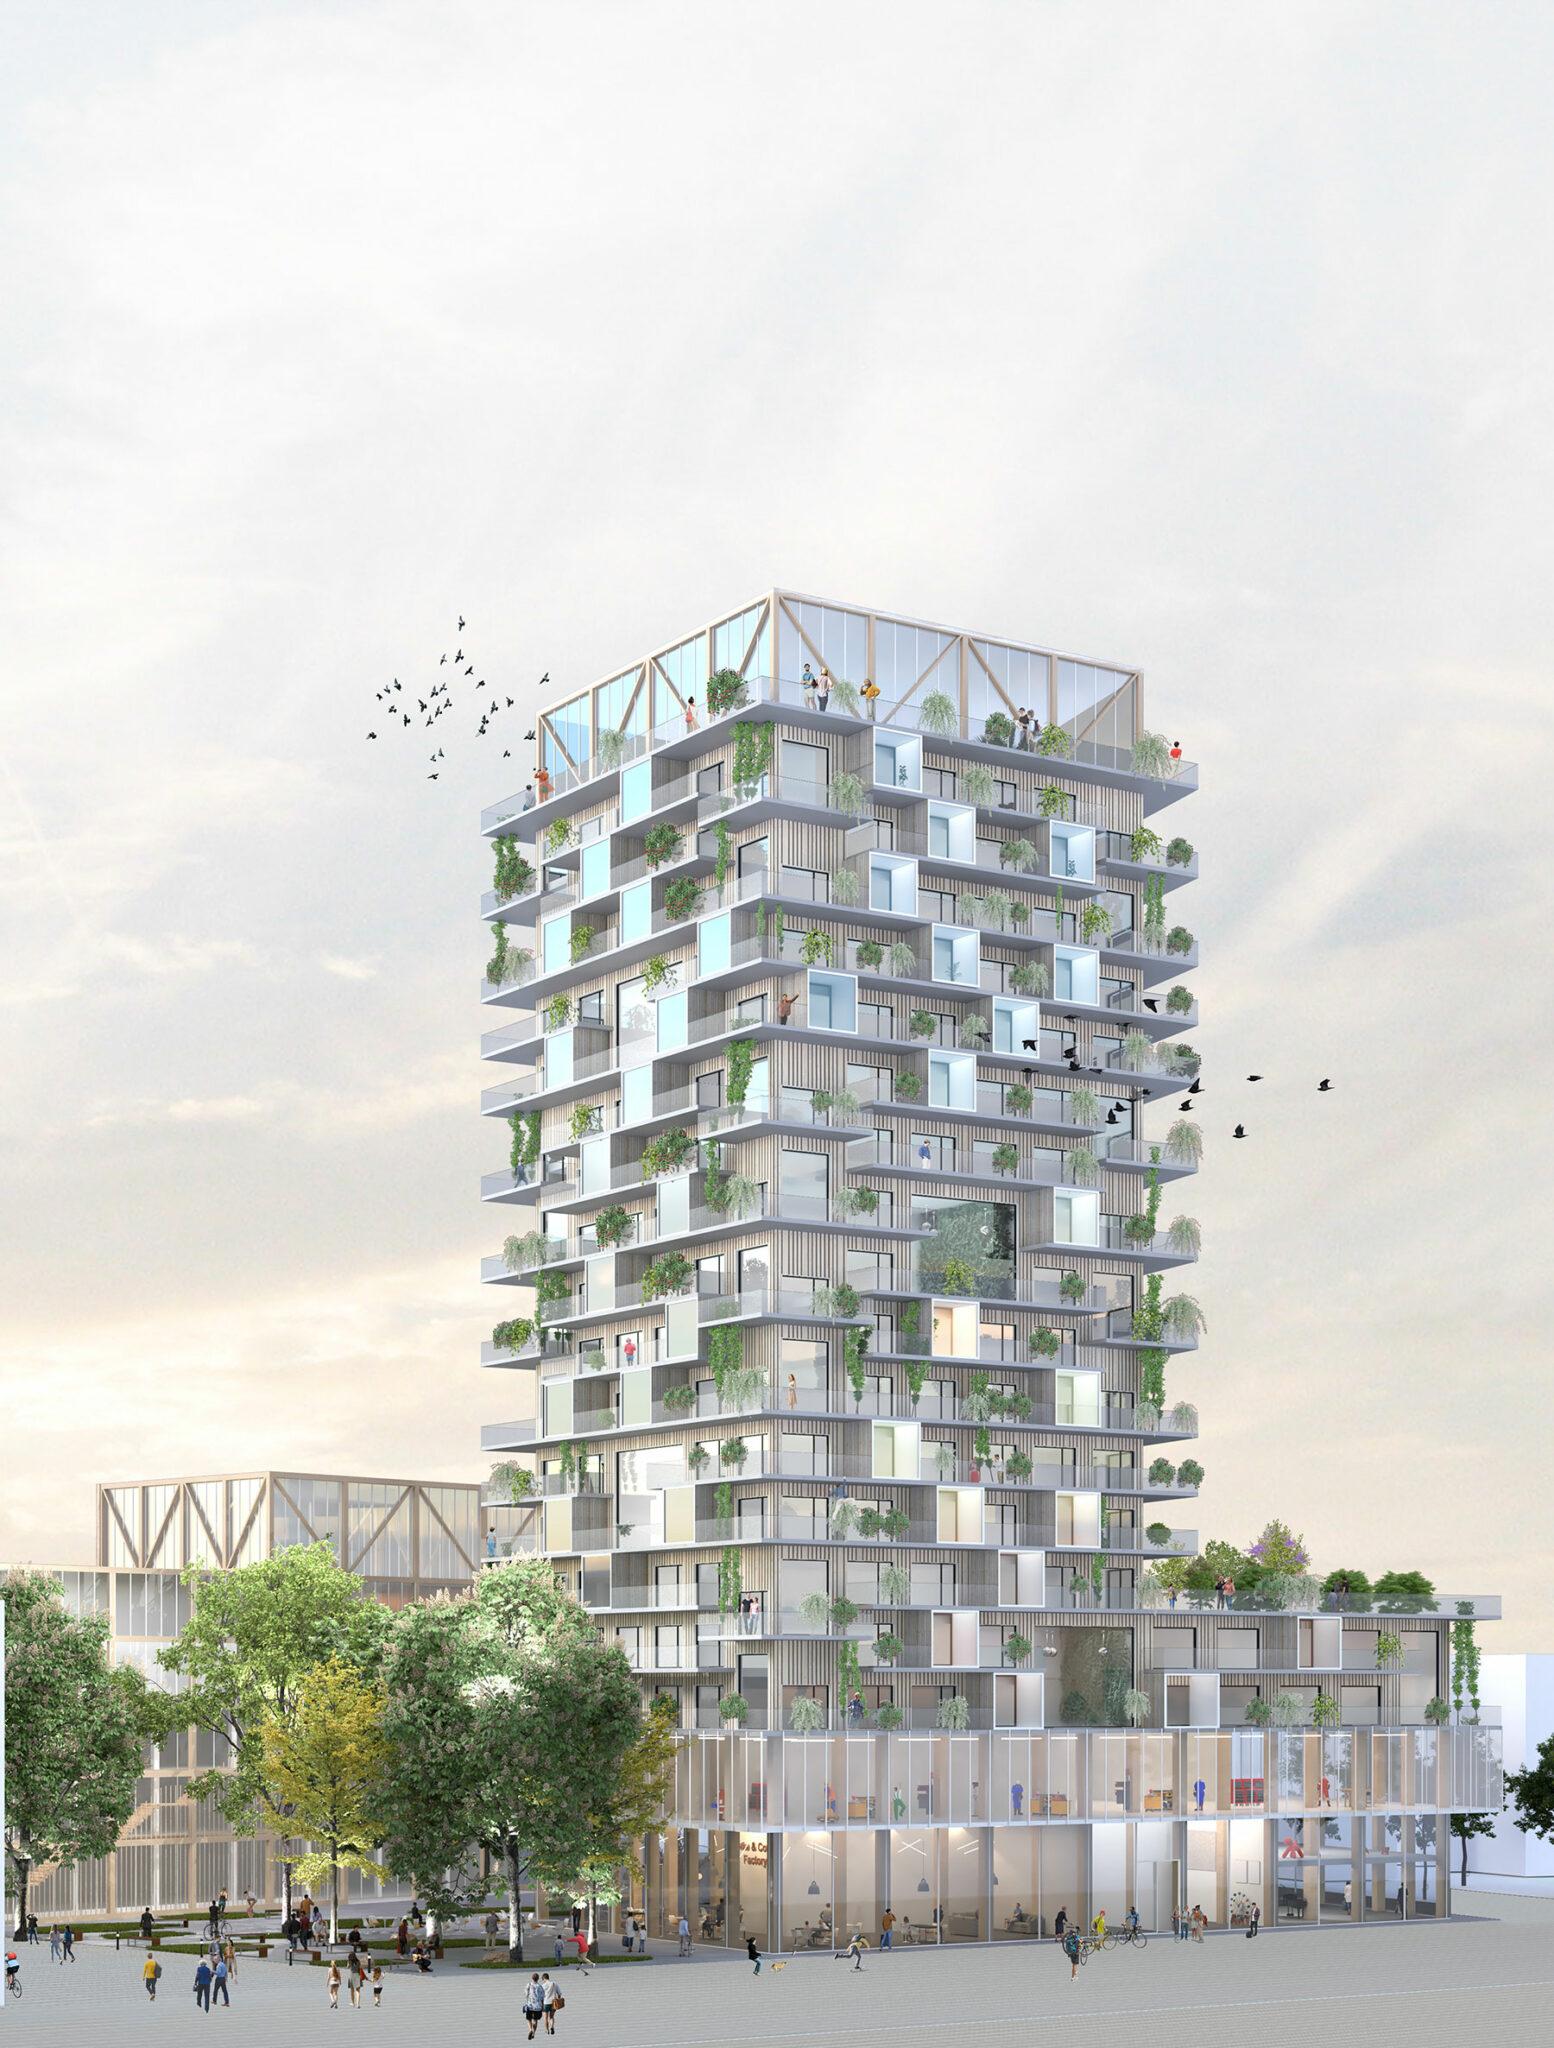 Postareal Böblingen: Visualization of the winning design (Credits: Büros Gutiérrez - De la Fuente Arquitectos / UTA Architekten und Stadtplaner)